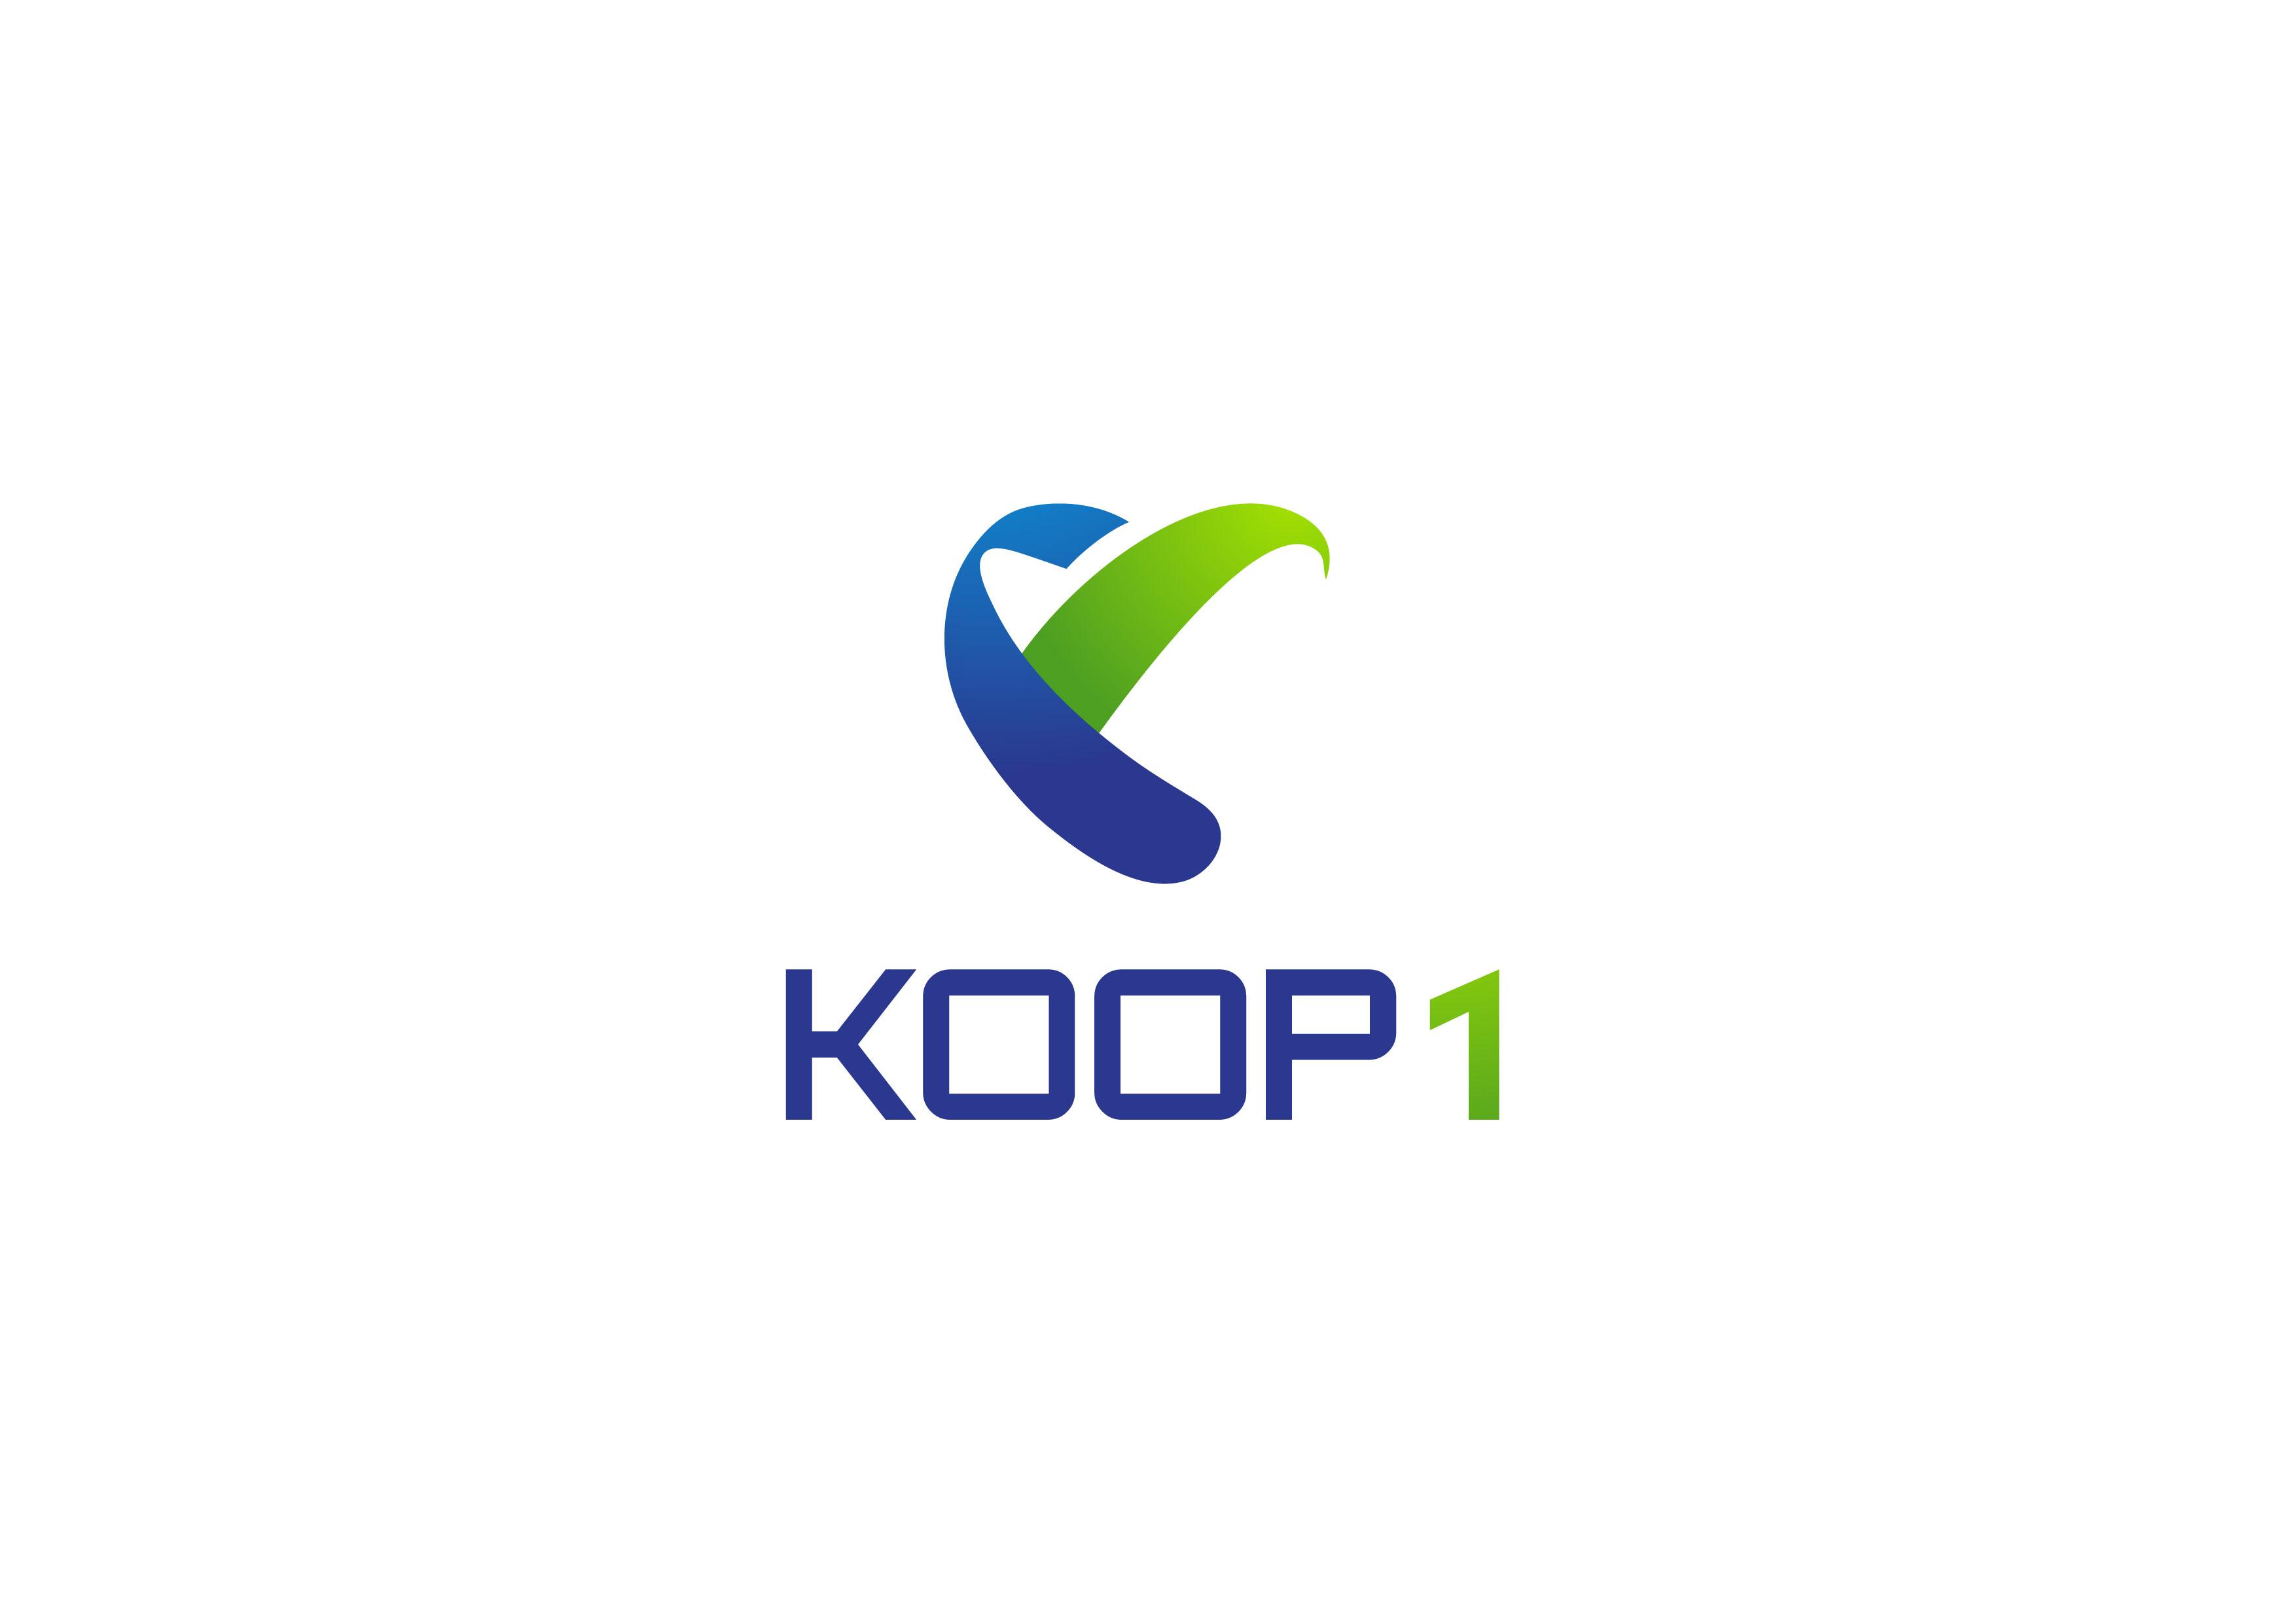 Logo Design by Ati Wahyuningsih - Entry No. 161 in the Logo Design Contest Creative Logo Design for KOOP 1.